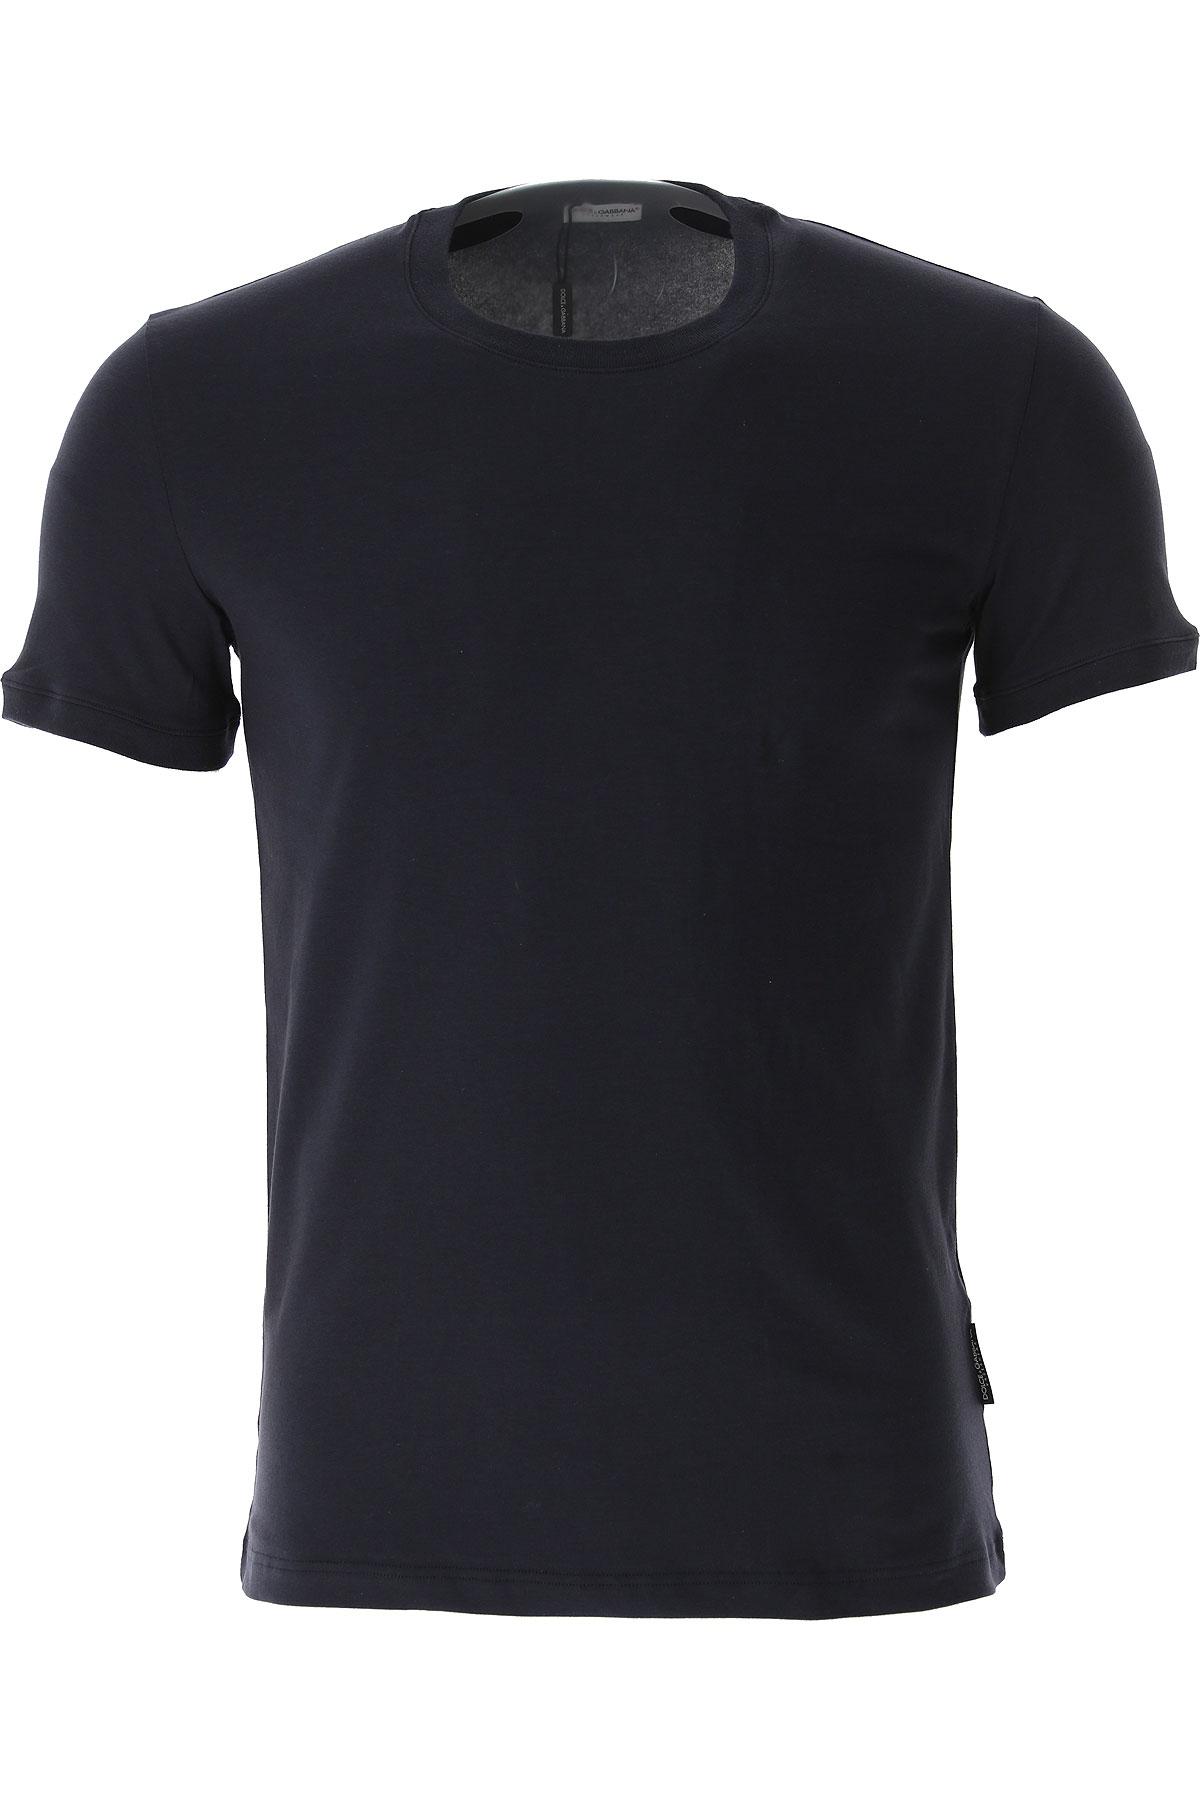 Image of Dolce & Gabbana T-Shirt for Men, Blue, Cotton, 2017, S (EU 3) M (EU 4)